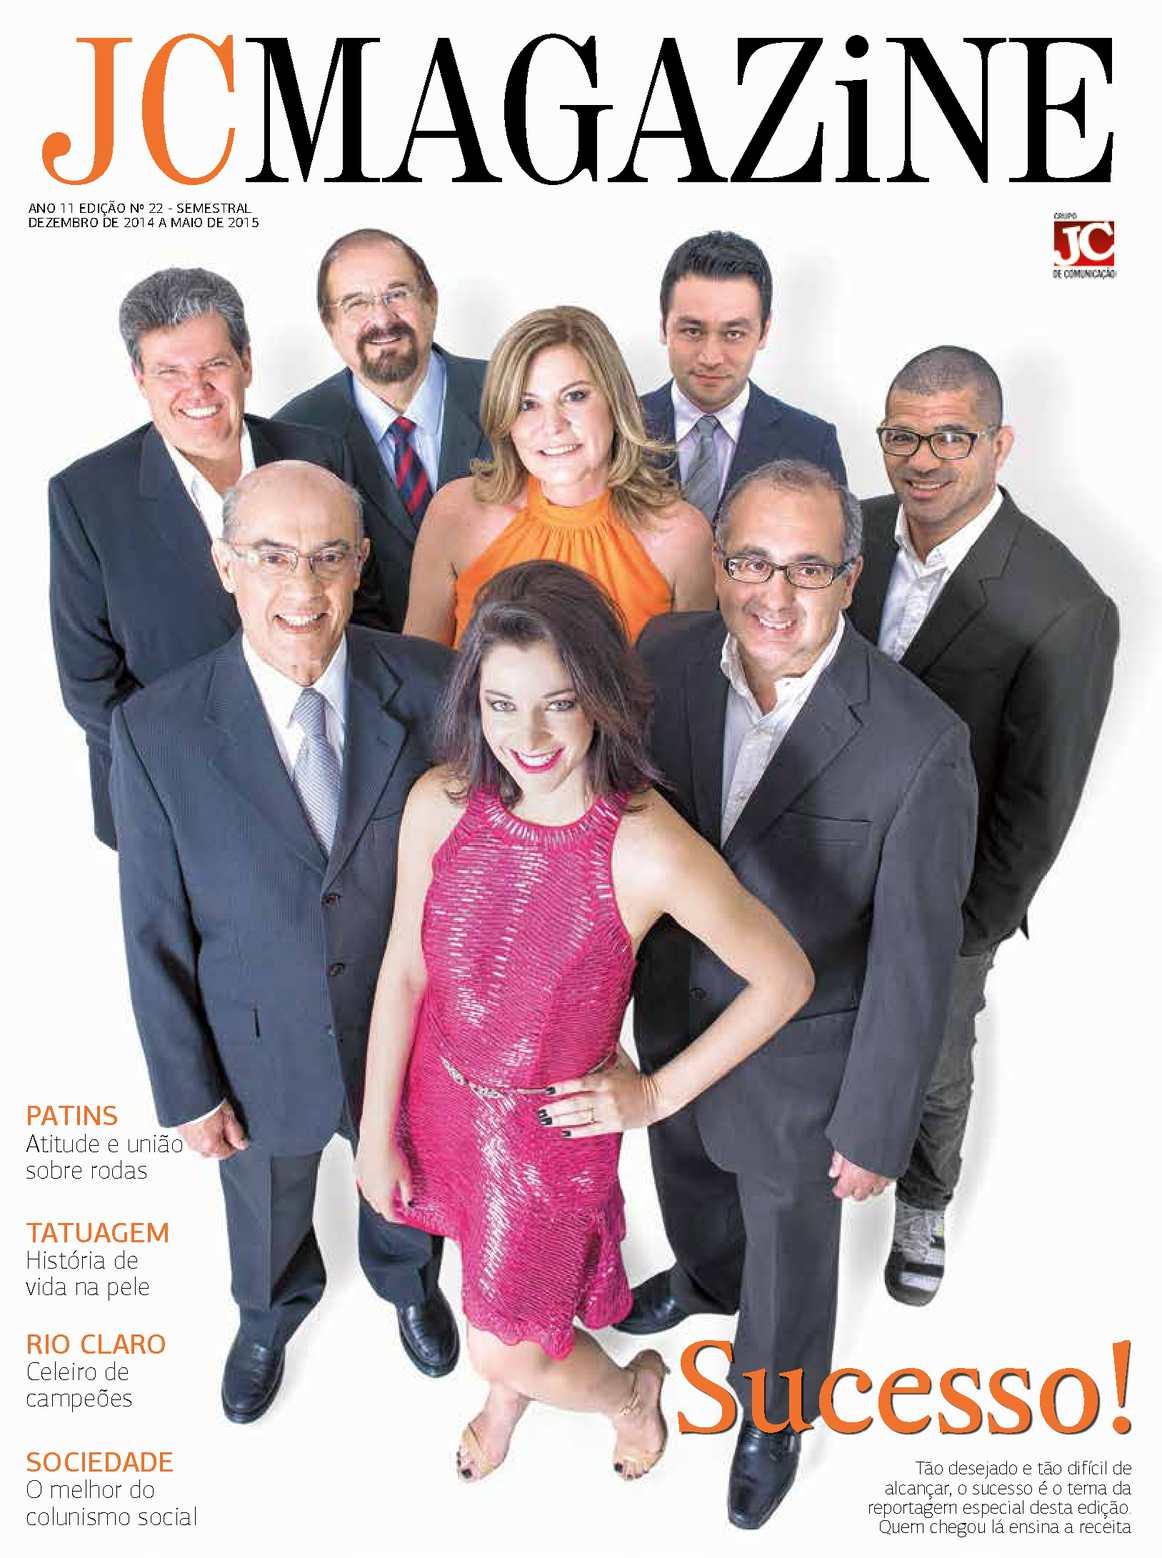 2db25f658 Calaméo - Revista Jc Magazine 22 Web